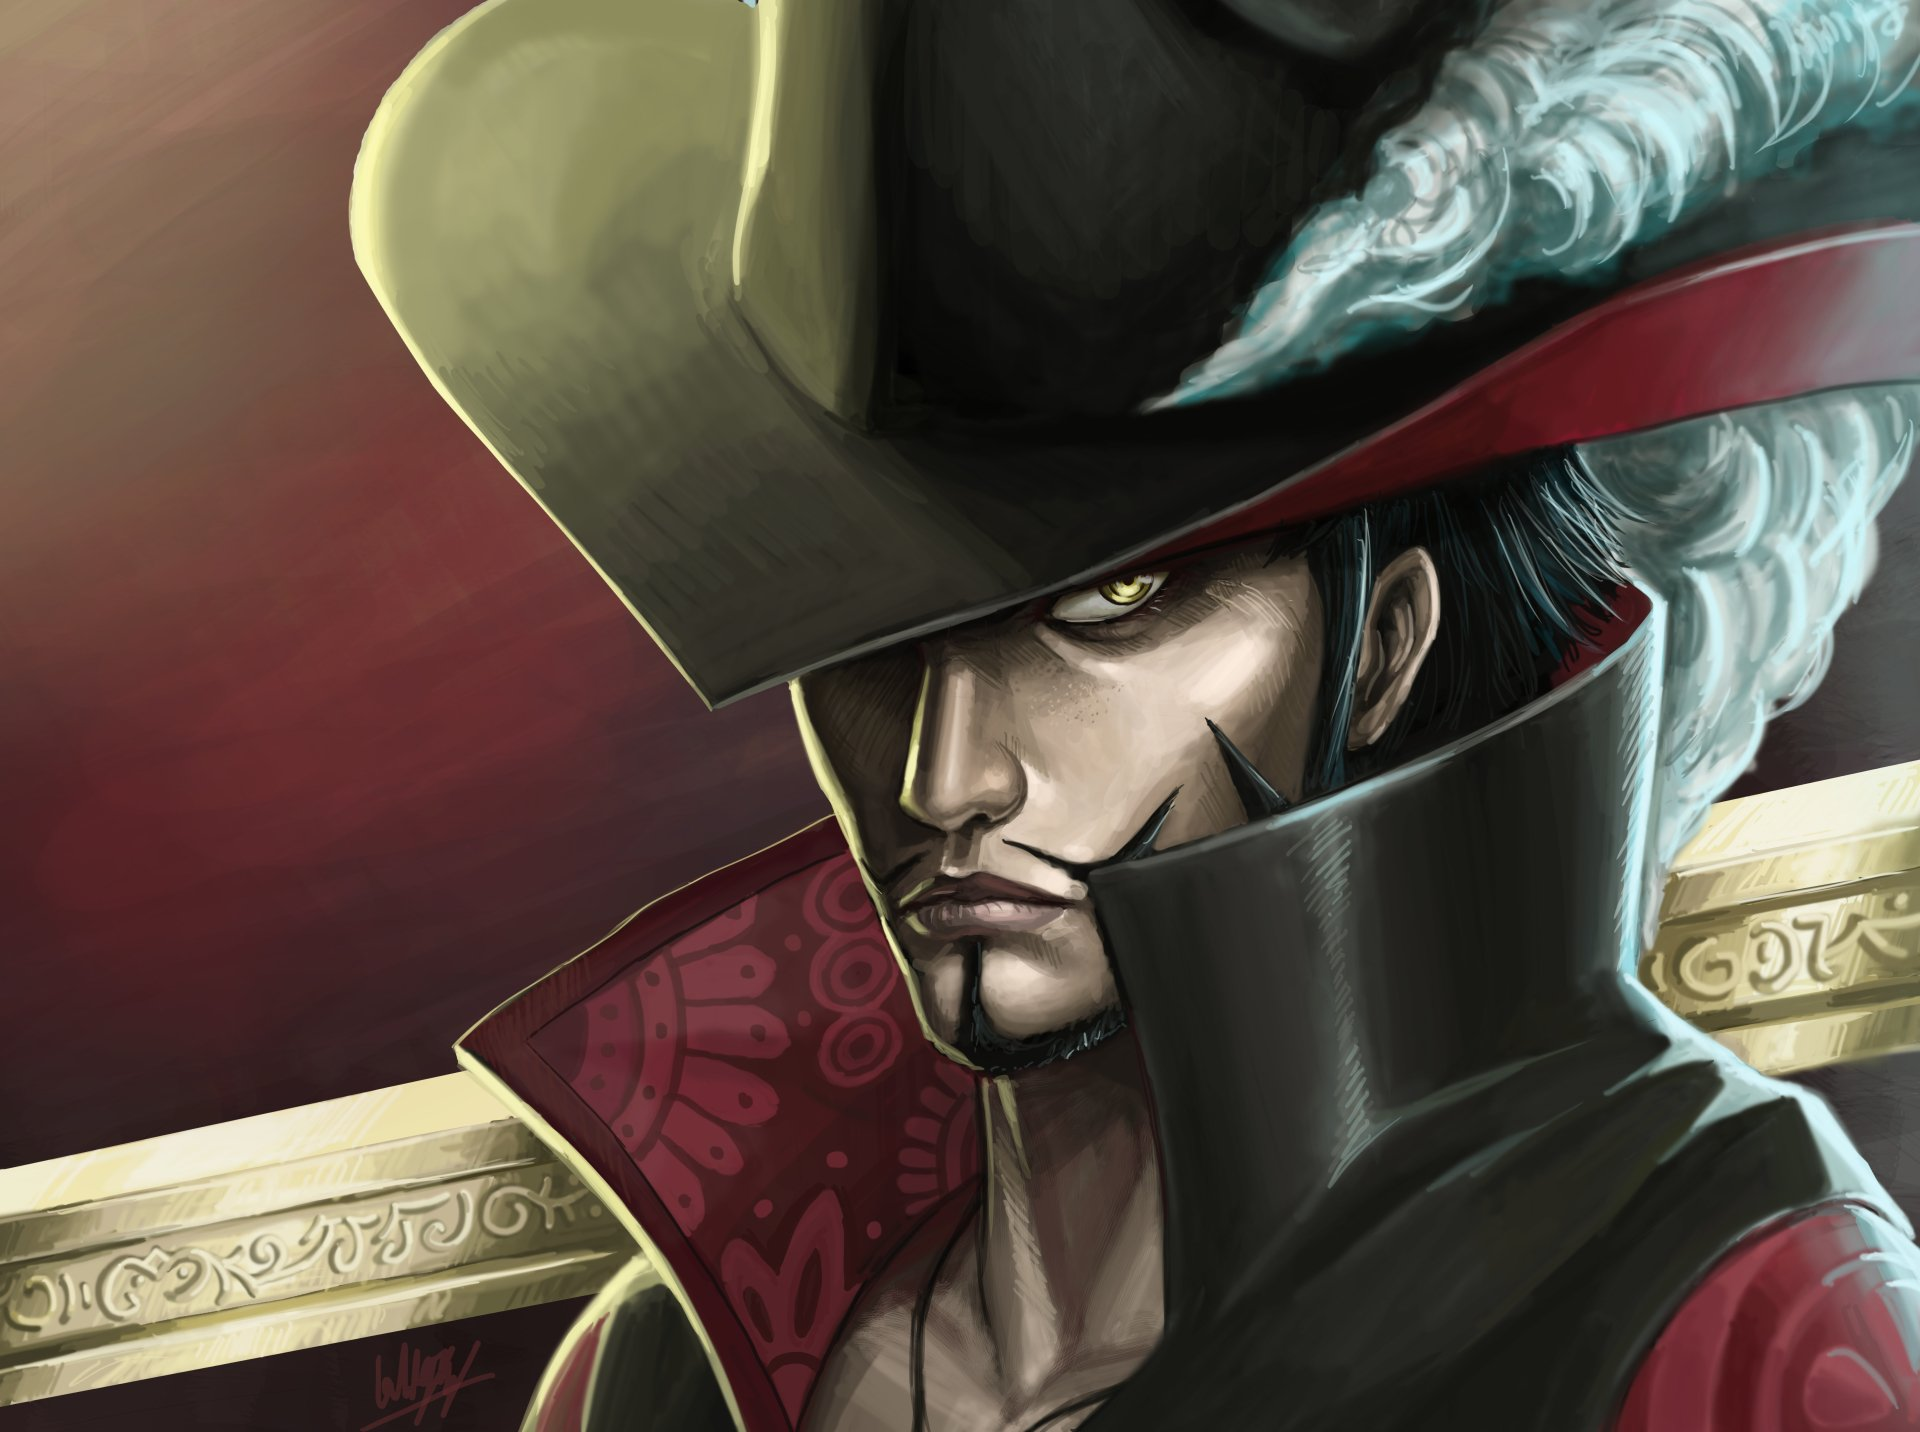 Anime - One Piece  Dracule Mihawk Wallpaper